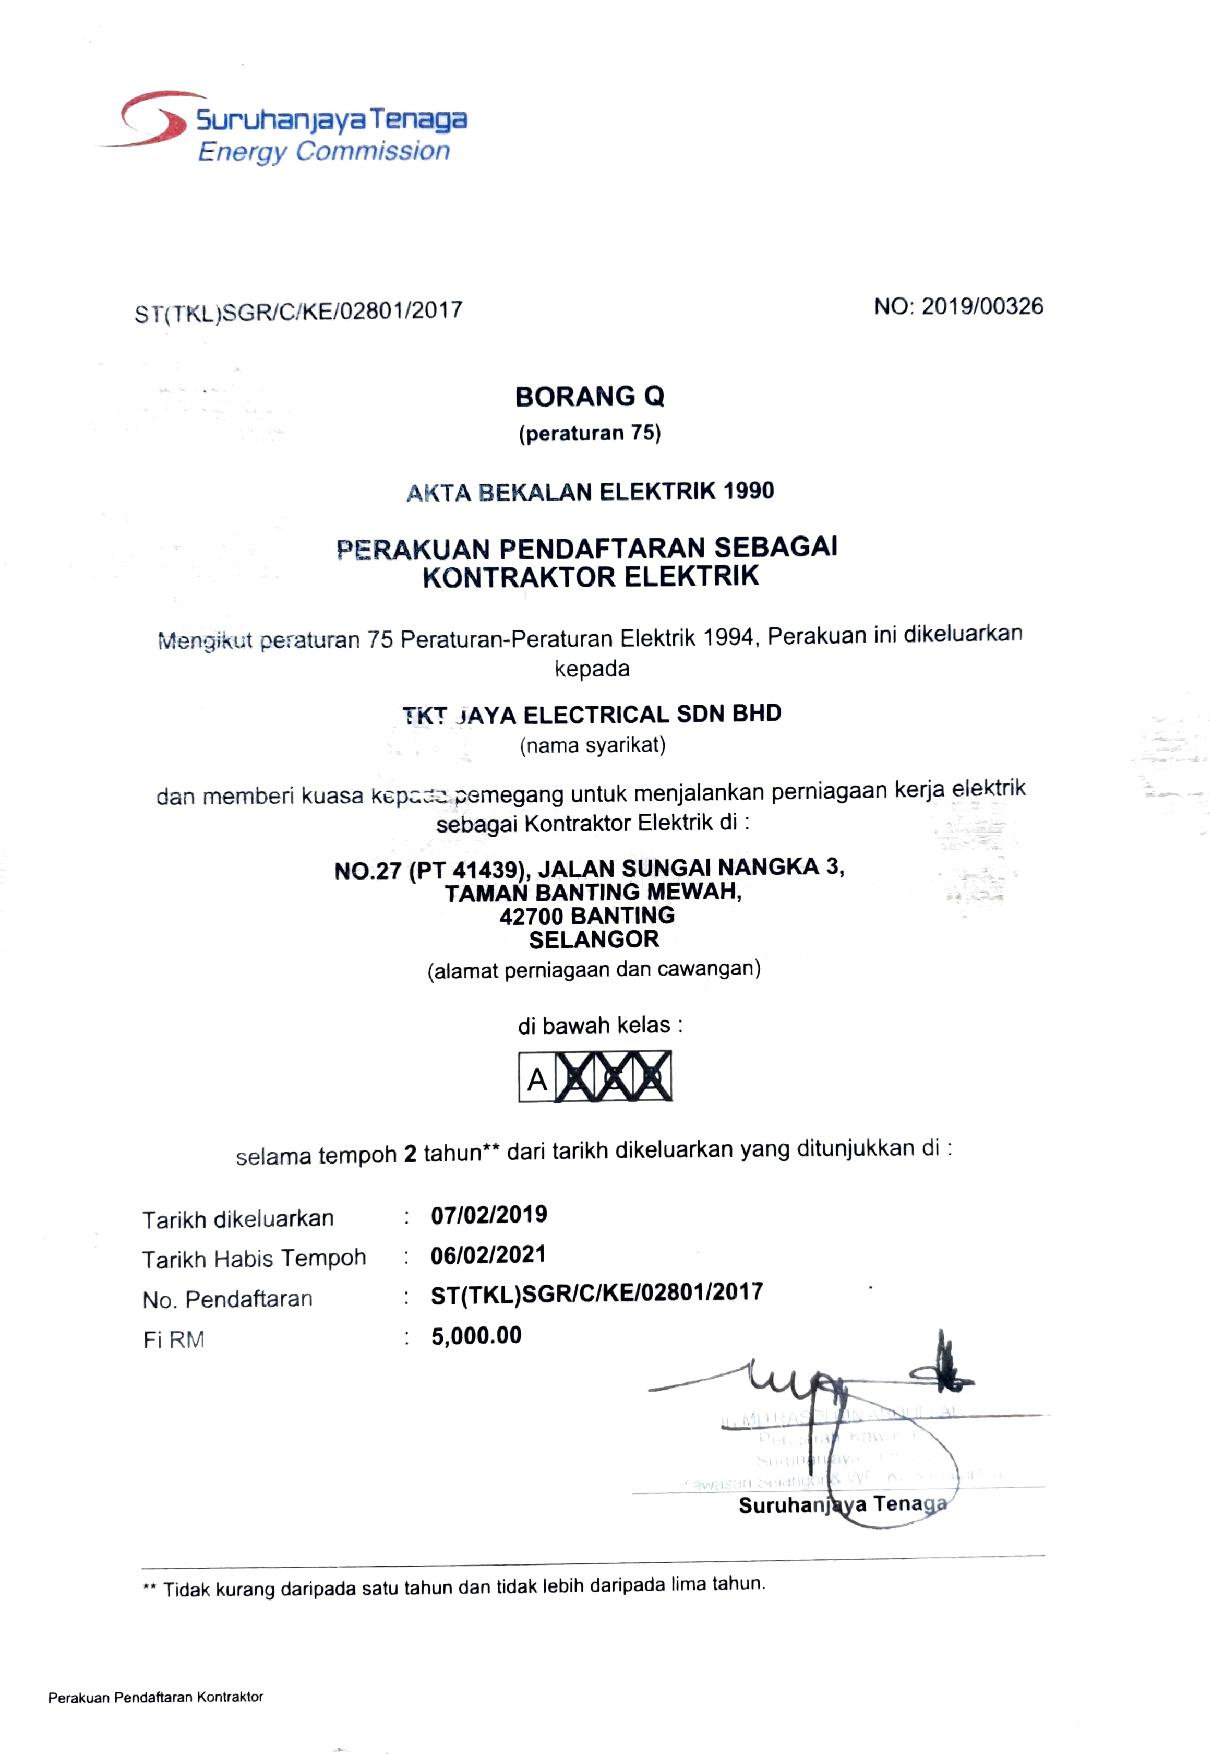 Documents Tkt Jaya Electrical